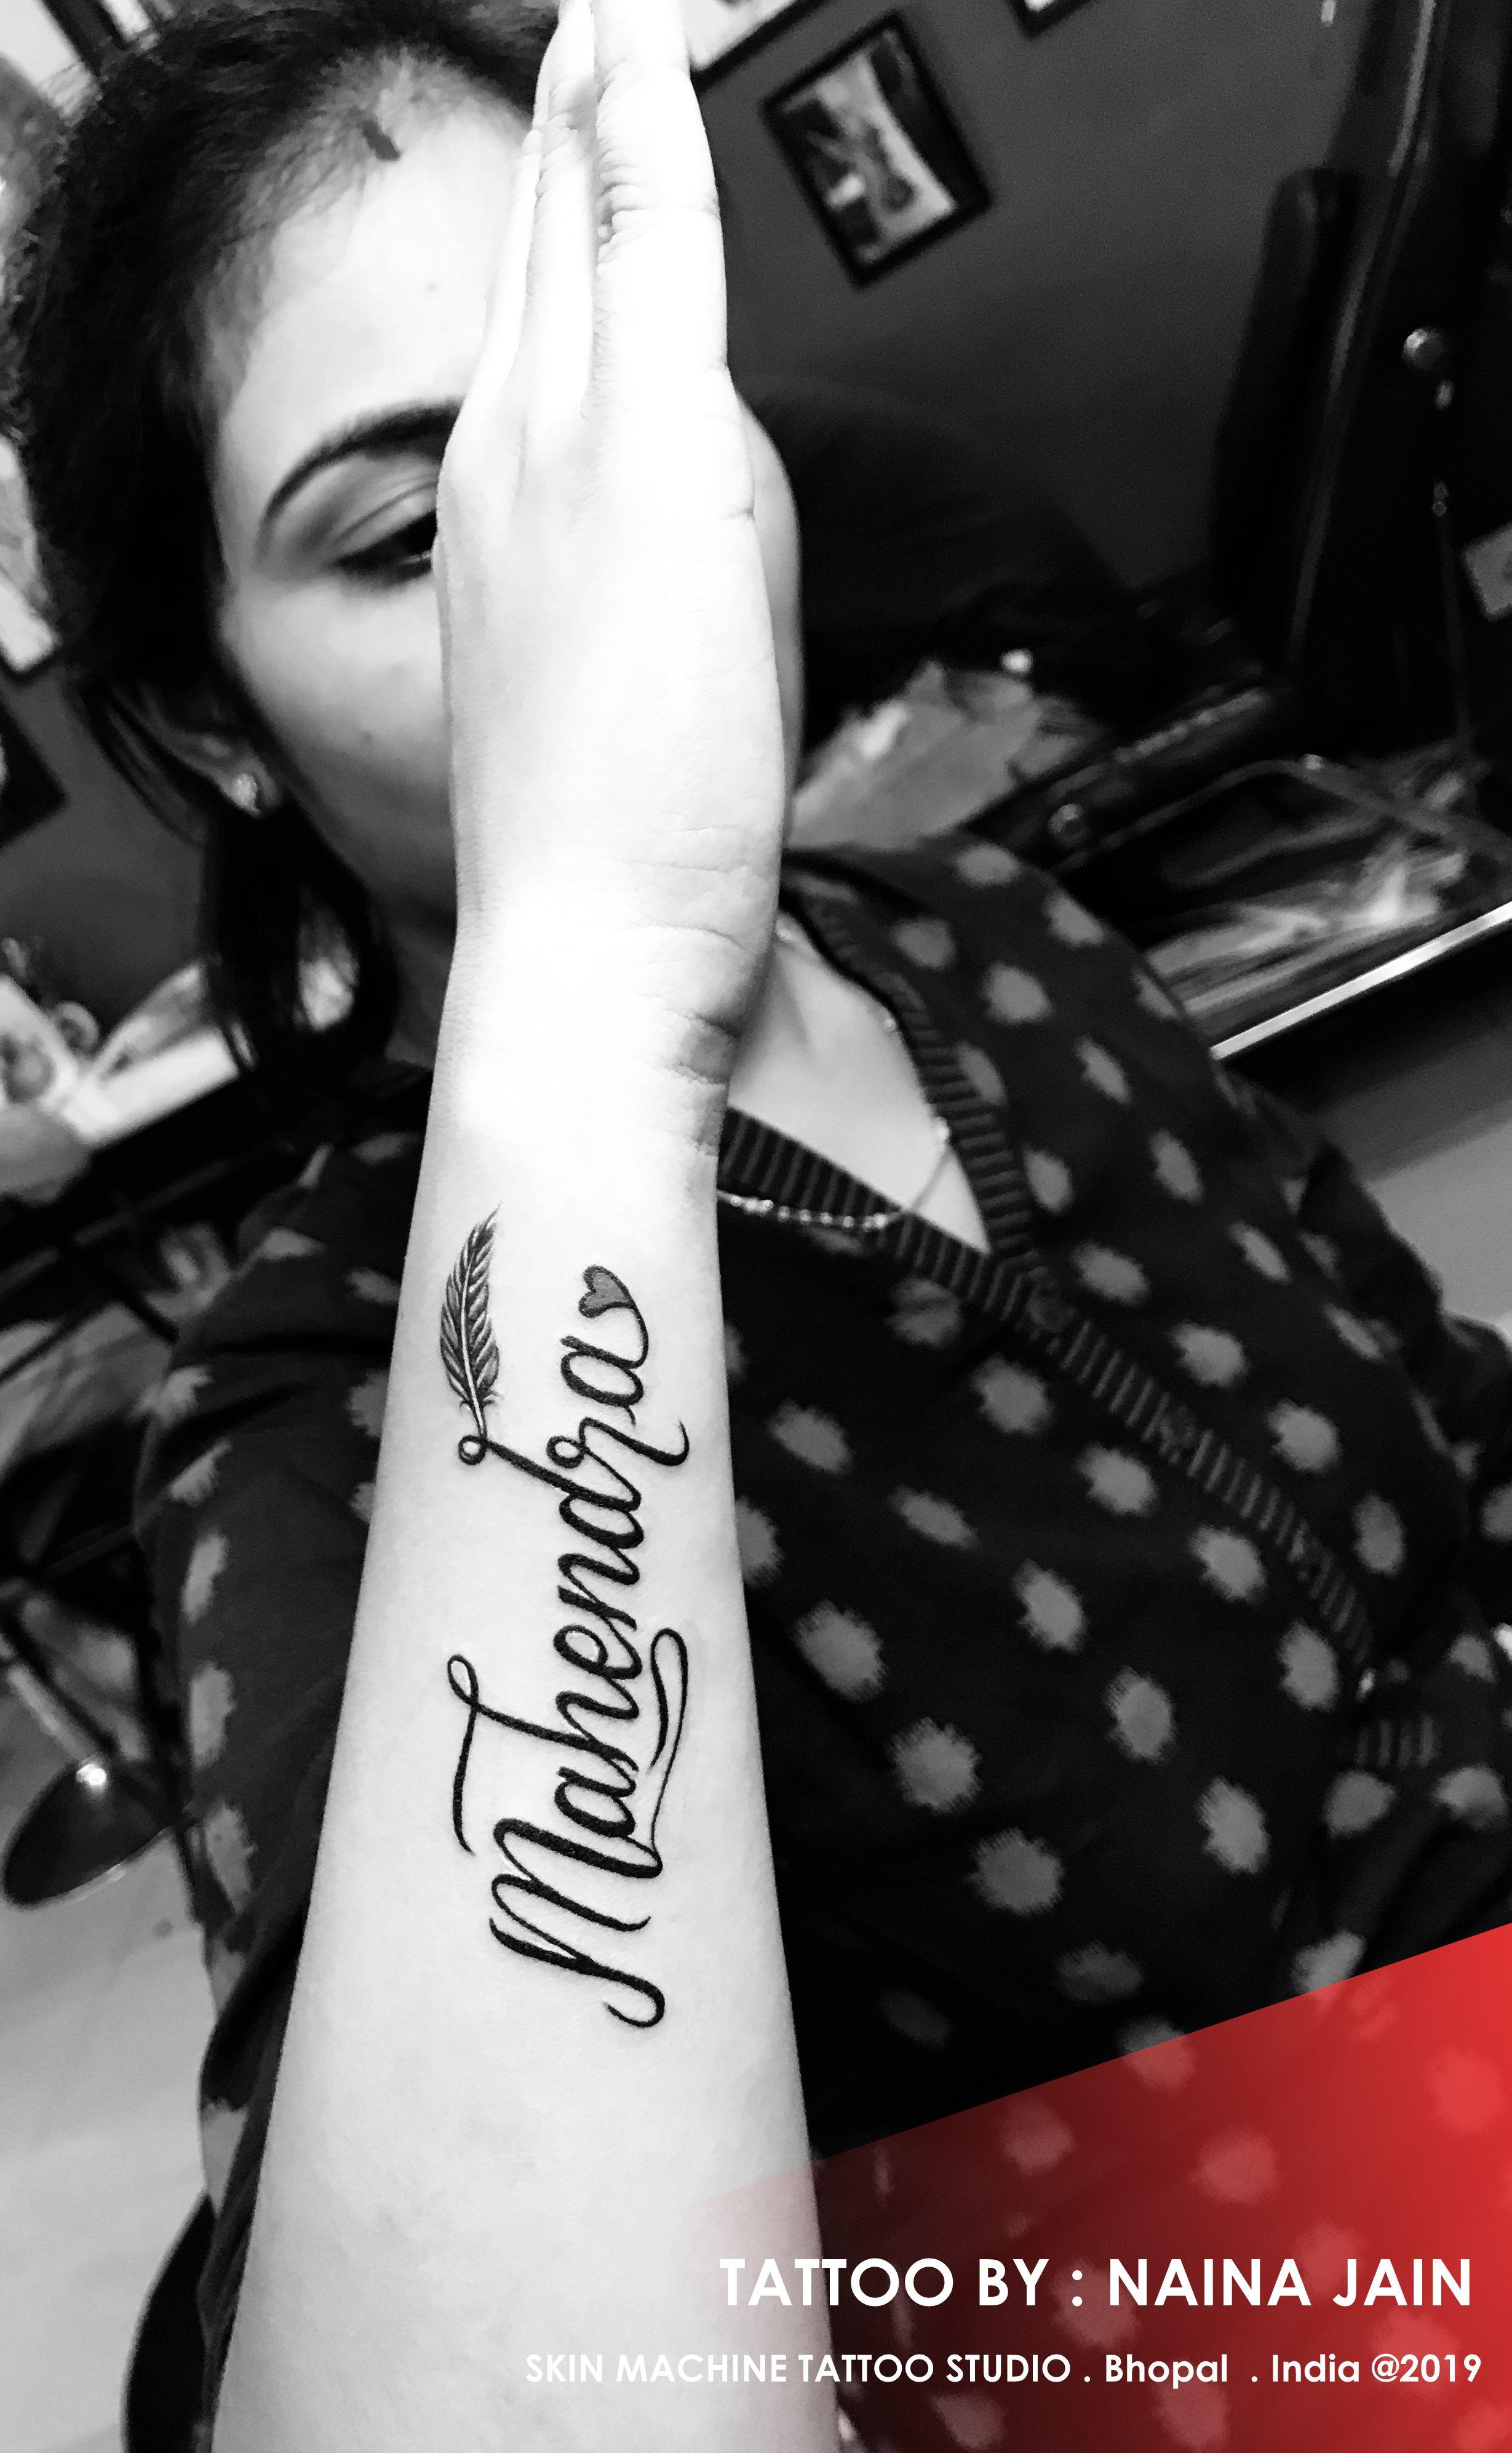 Beautifully Designed Mahendra Name Tattoo By Naina Jain Skin Machine Tattoo Studio Skinmachinetattoo Email For Appoint Tattoo Studio Tattoos Name Tattoos